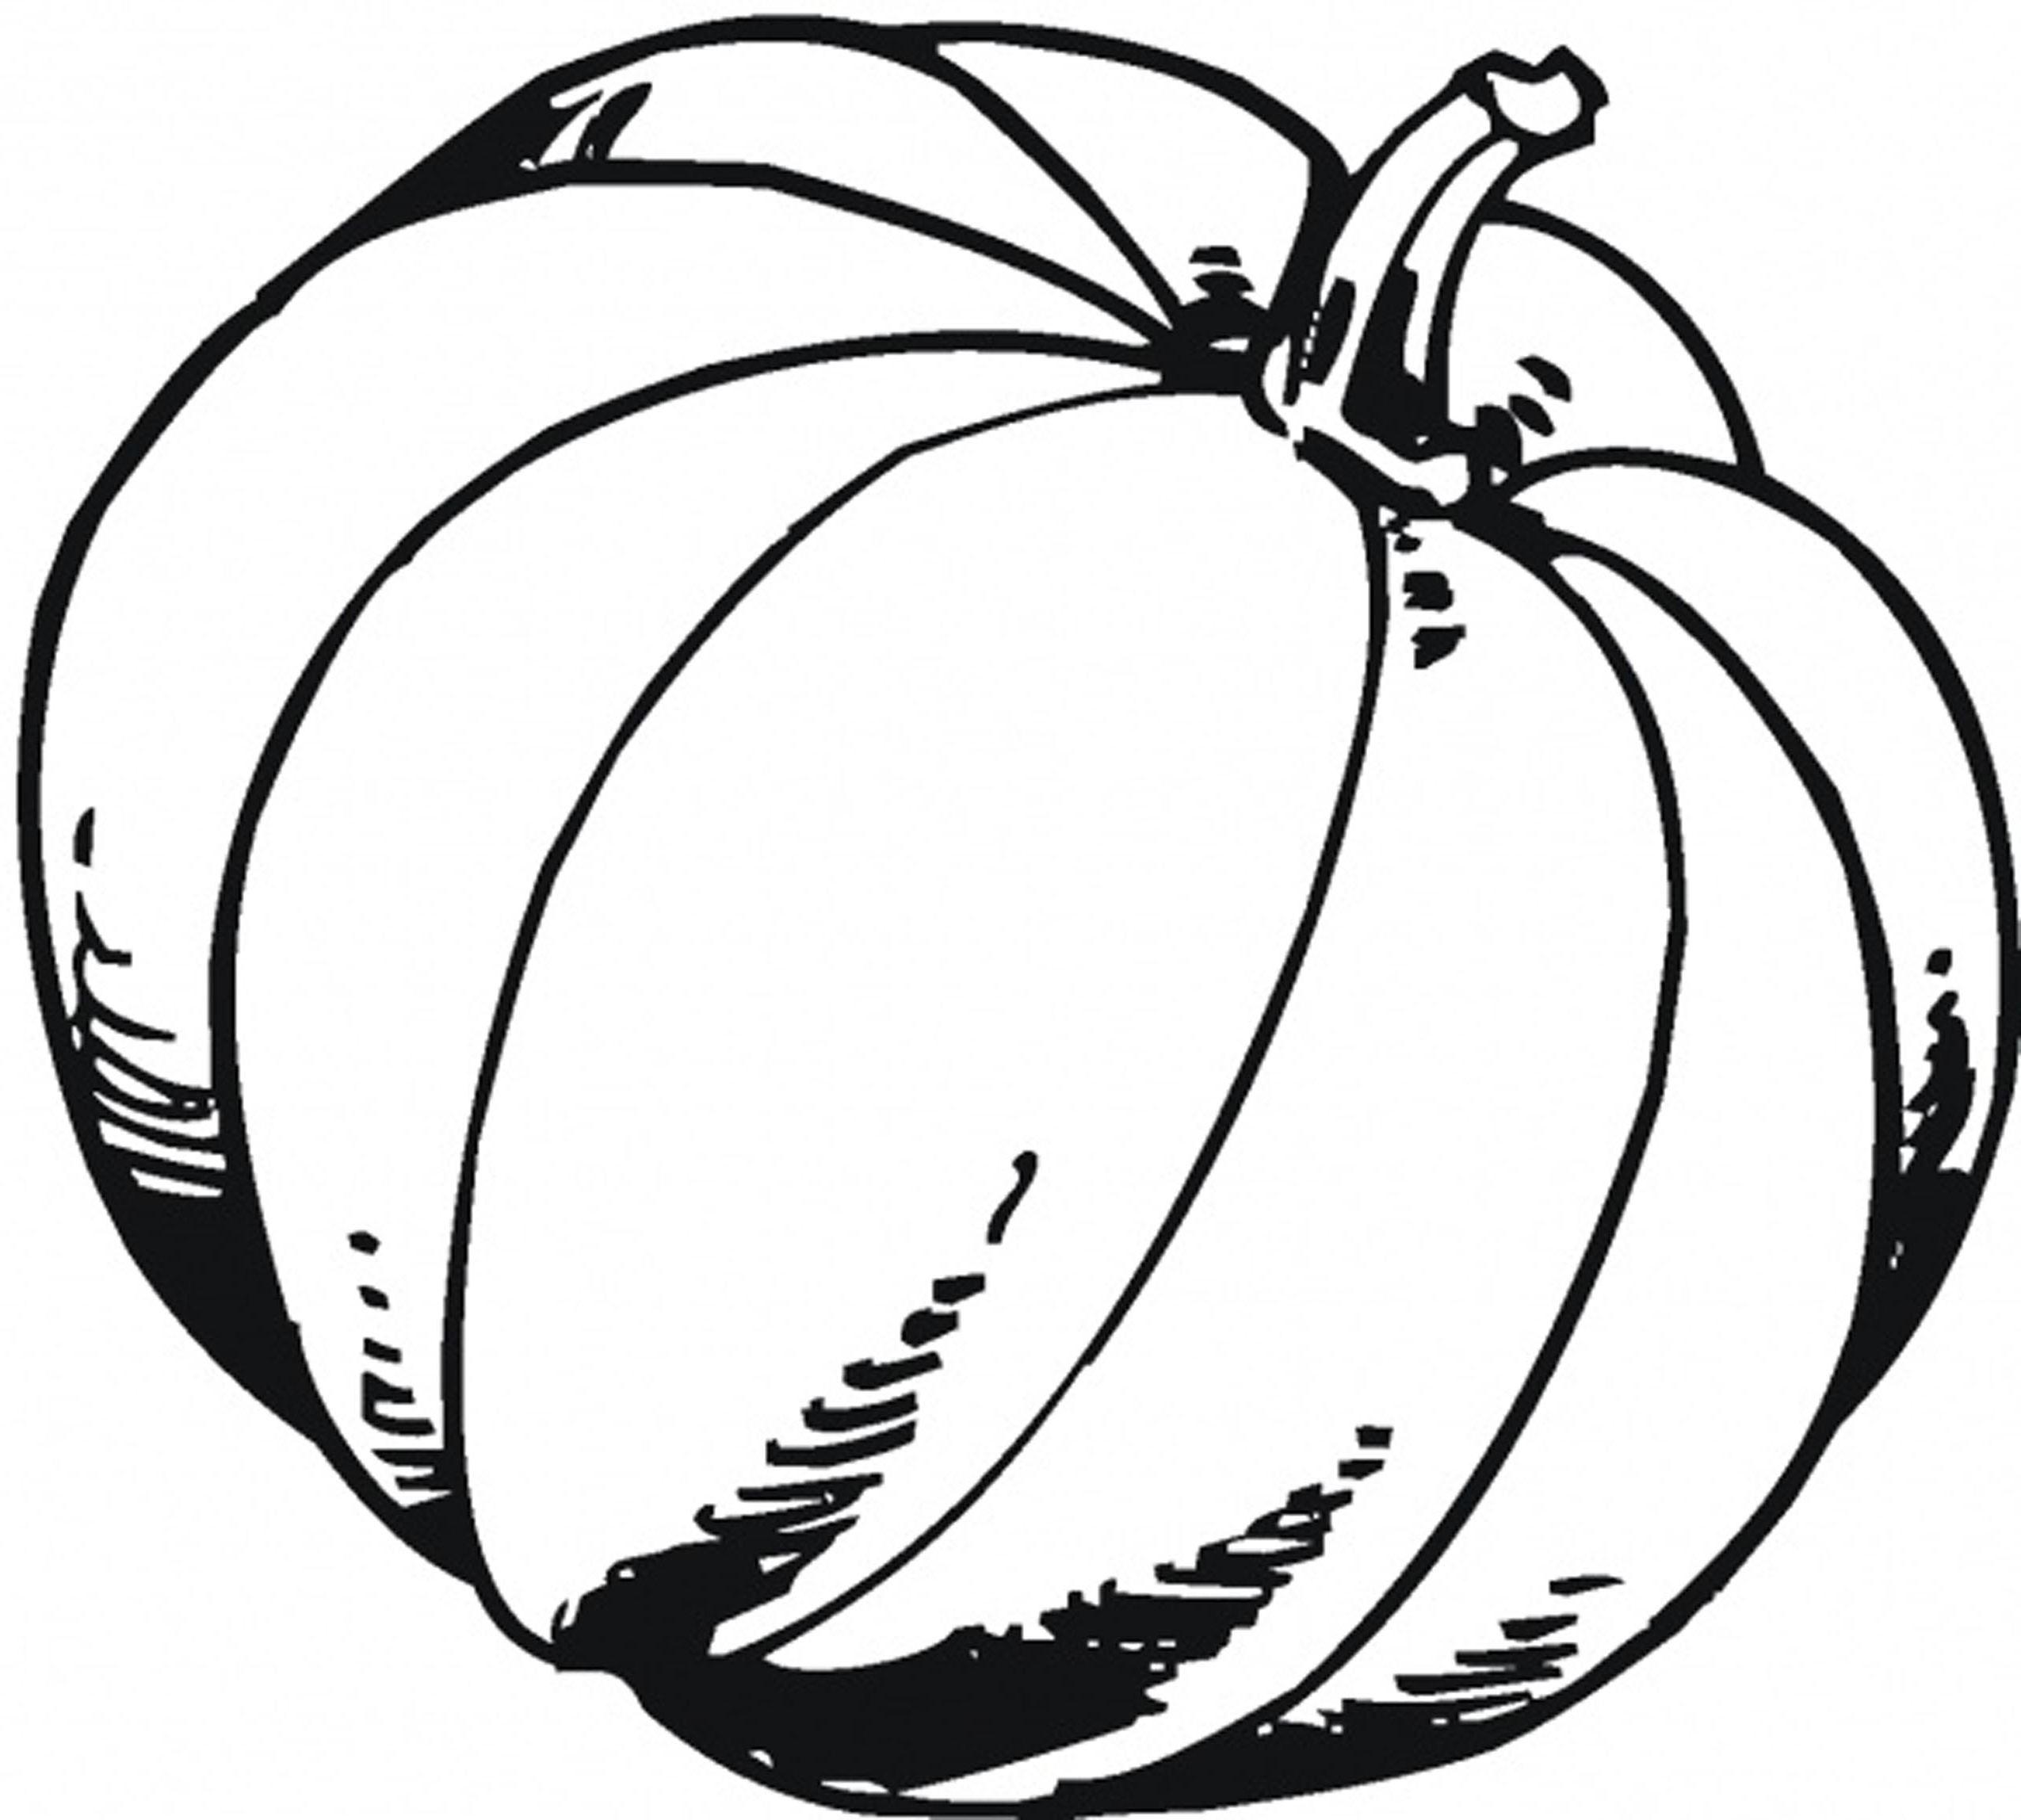 Pumpkin Outline Printable | Free download on ClipArtMag